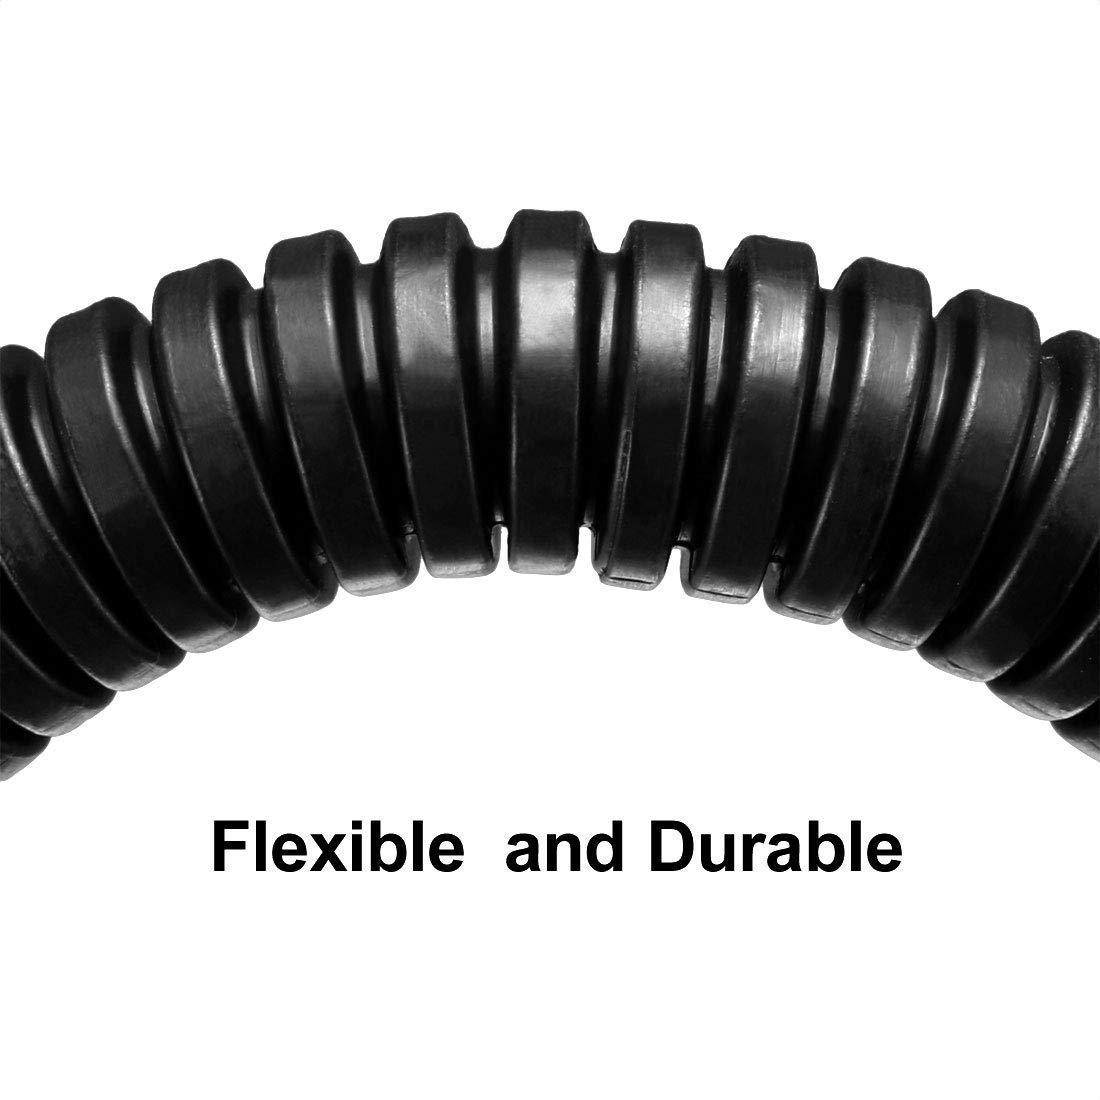 Sourcingmap Tubo corrugado Conduit PP Tubo de polietileno Flexible Tubo Manguera Negro 7 mm Di/ámetro interior 10 mm Di/ámetro Exterior 4,6 m de largo.